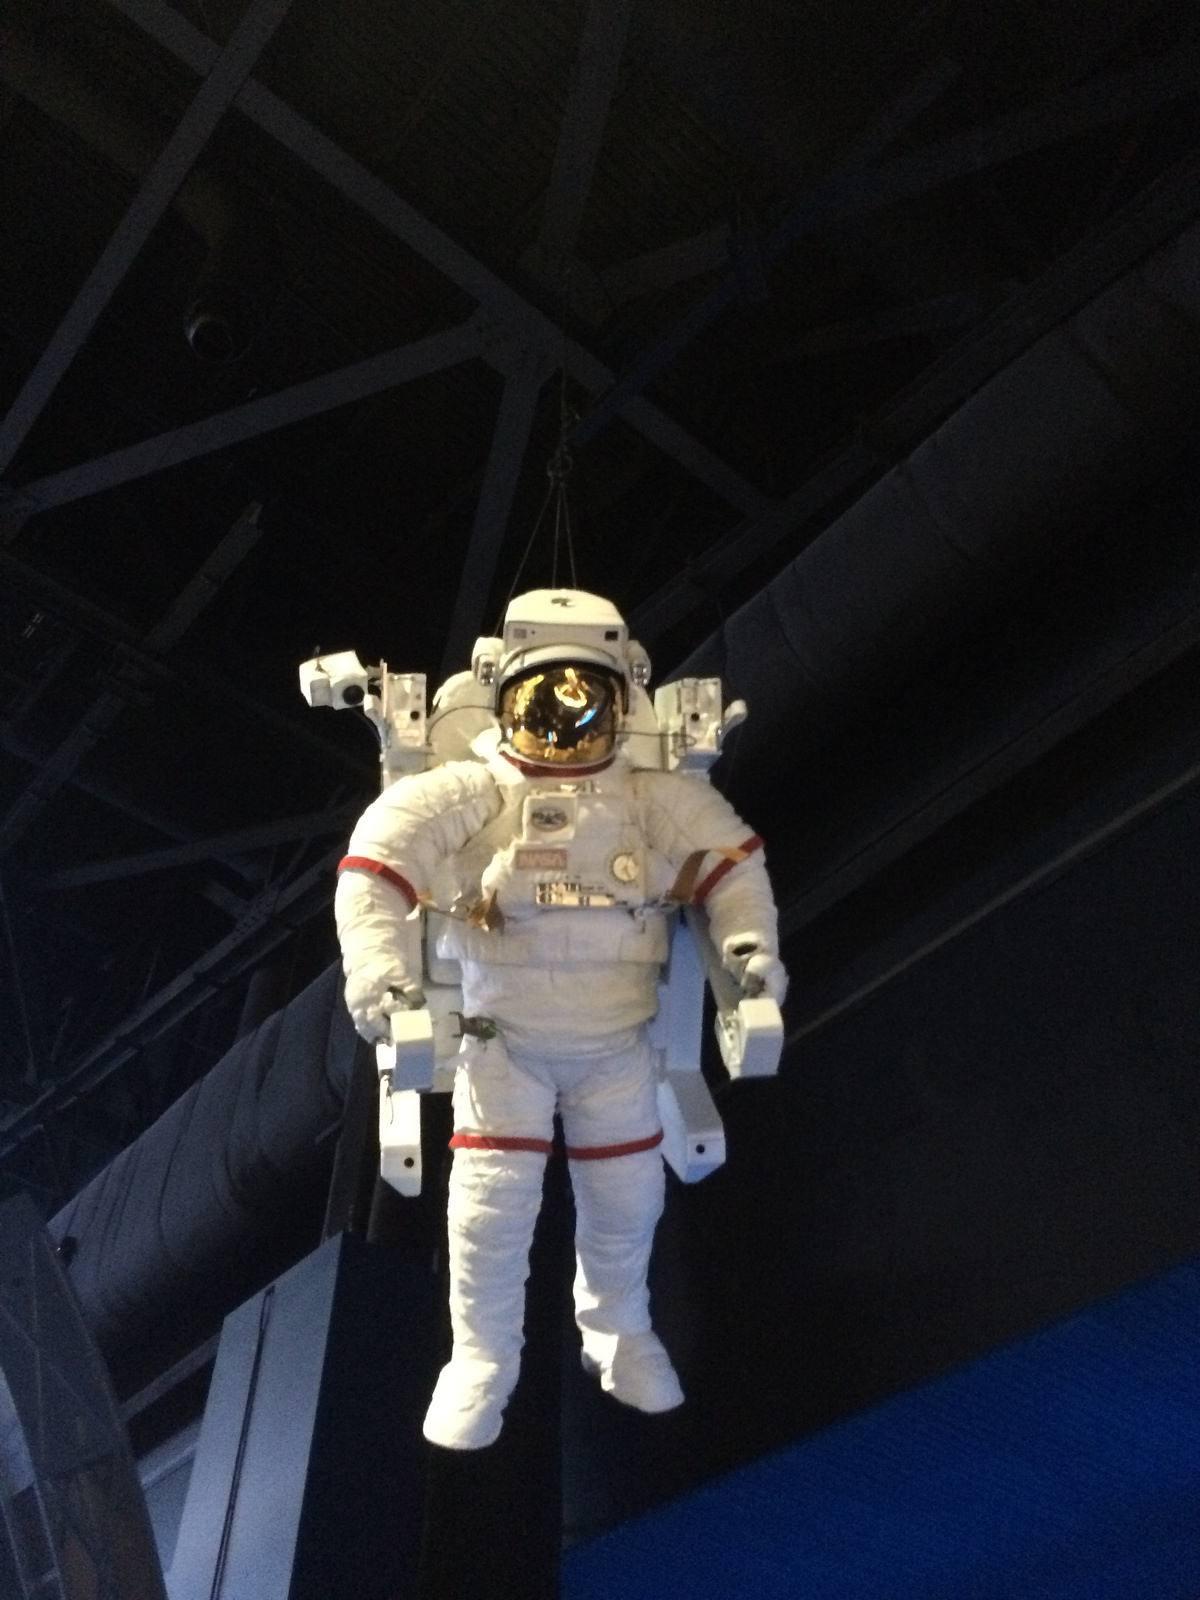 kennedy space center11 Kennedy Space Center   Popular Destination